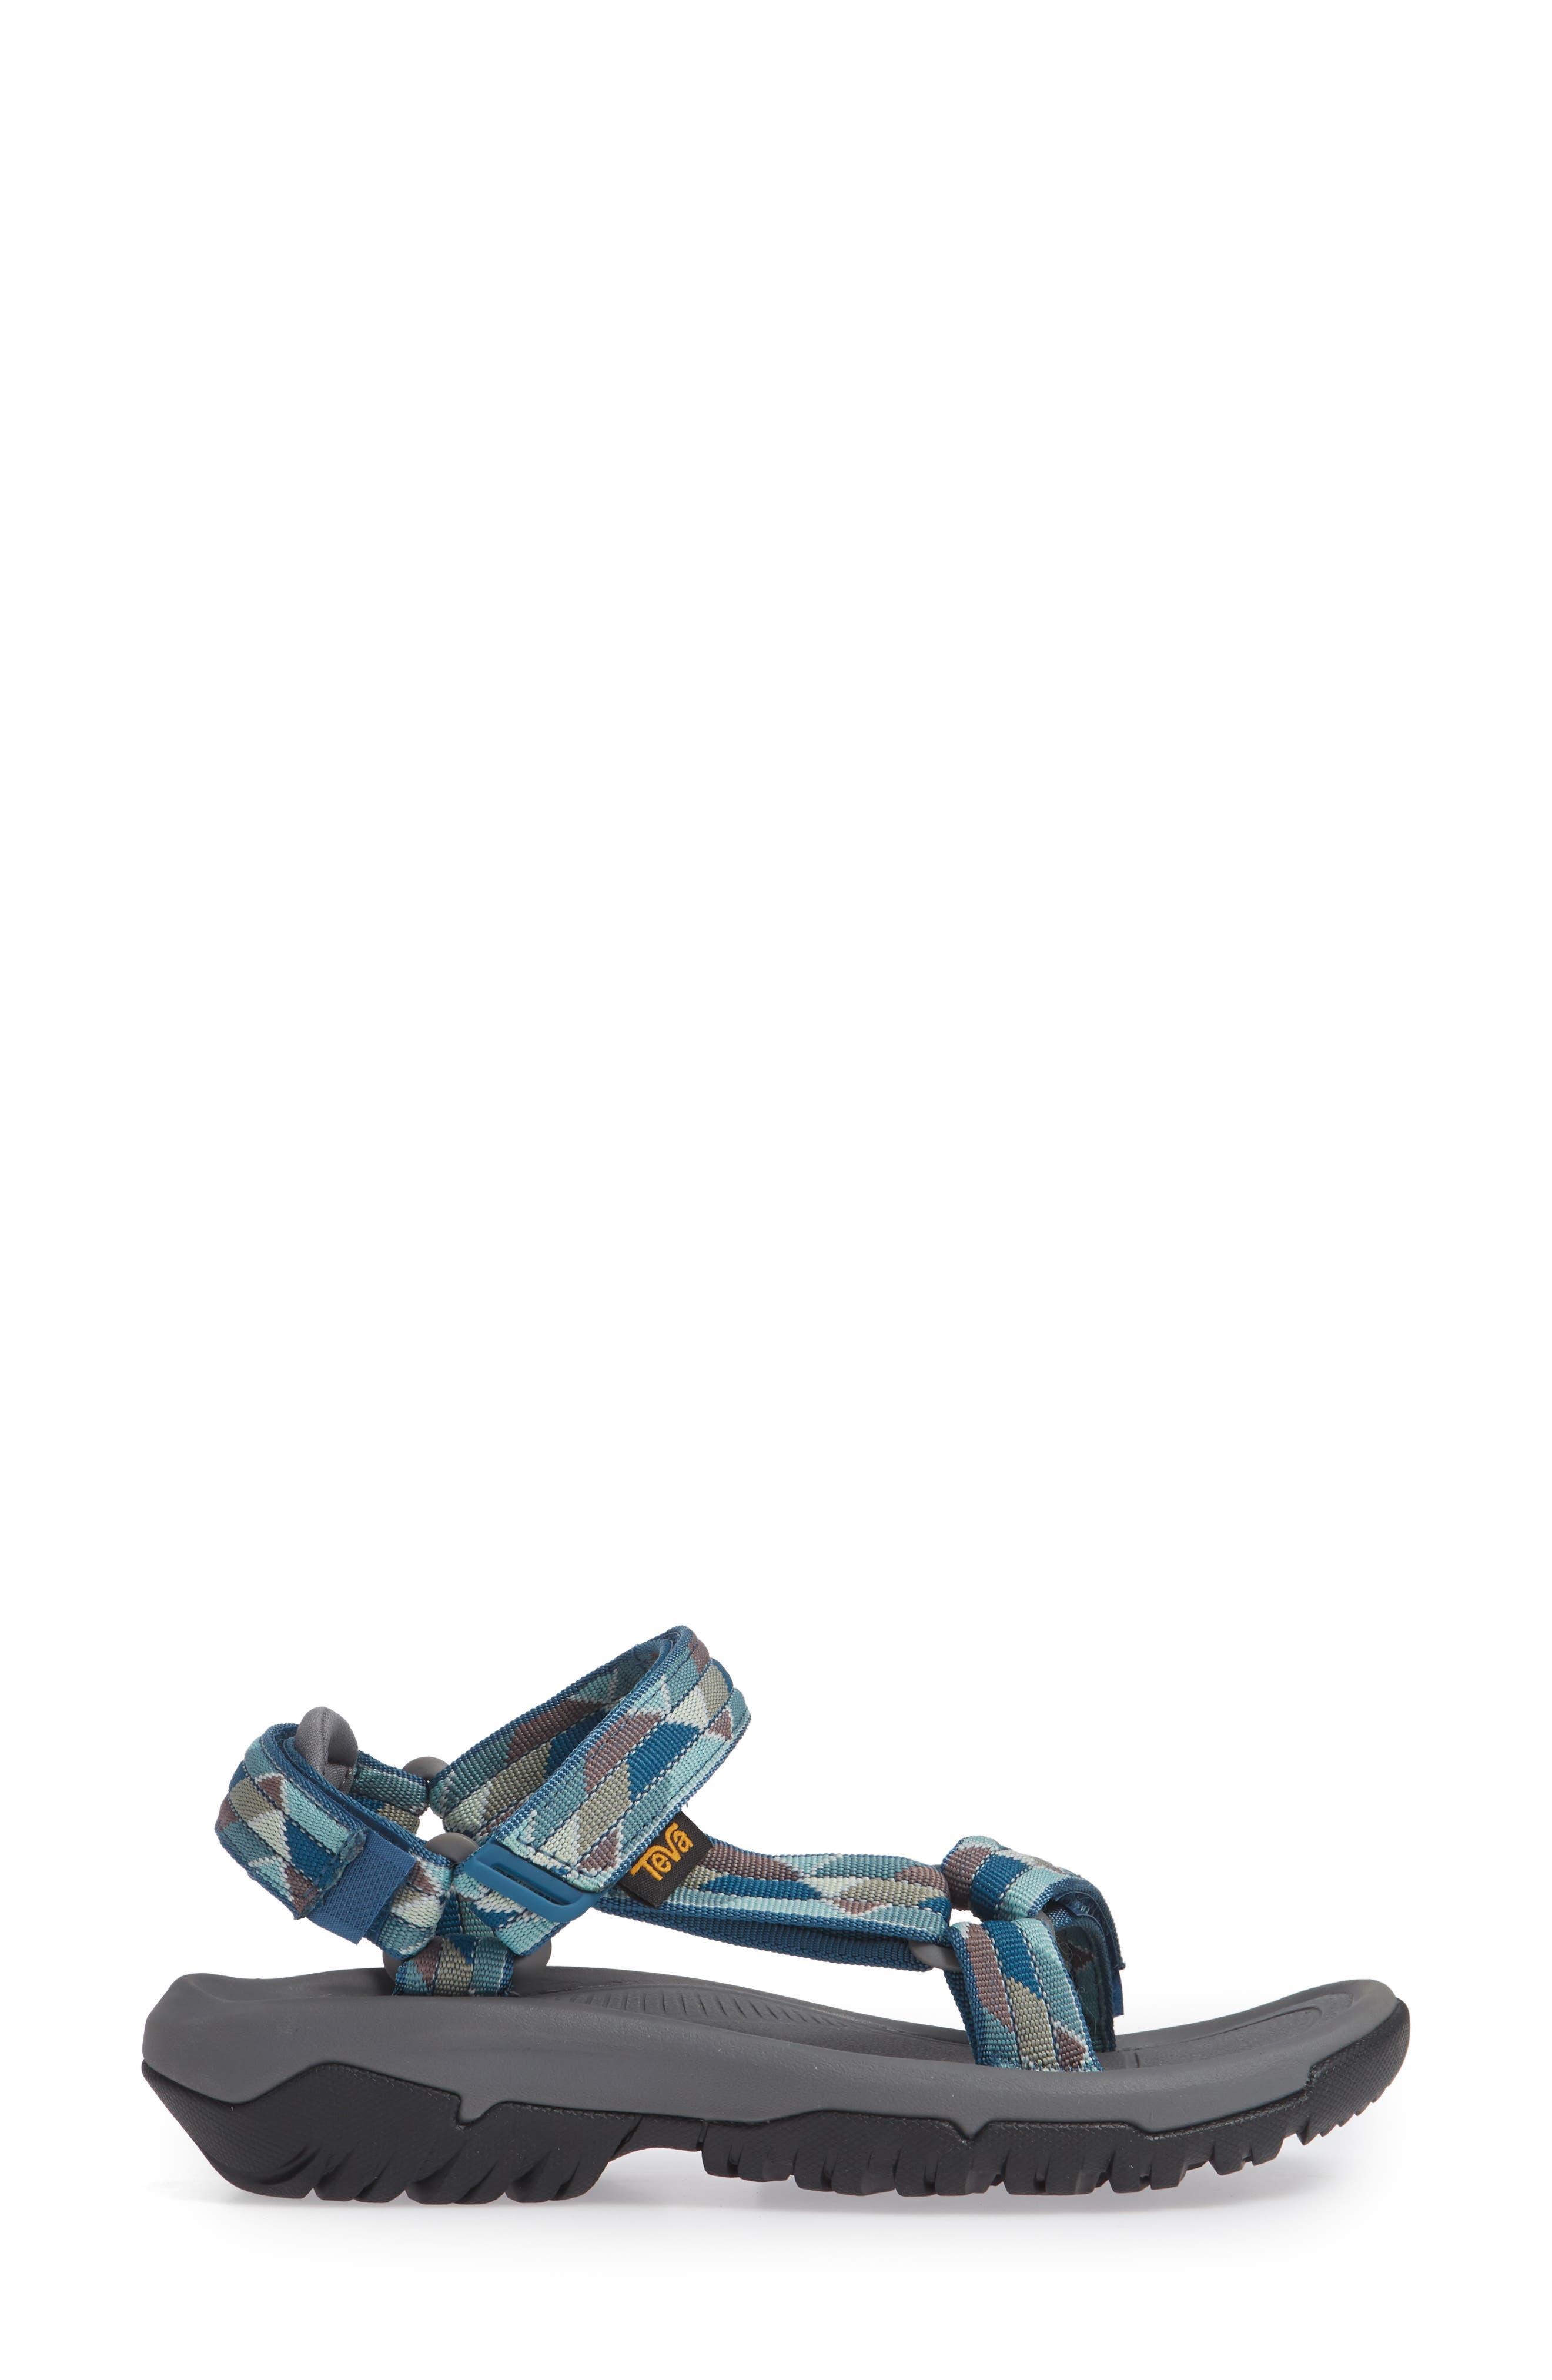 Hurricane XLT 2 Sandal,                             Alternate thumbnail 5, color,                             Blue Fabric